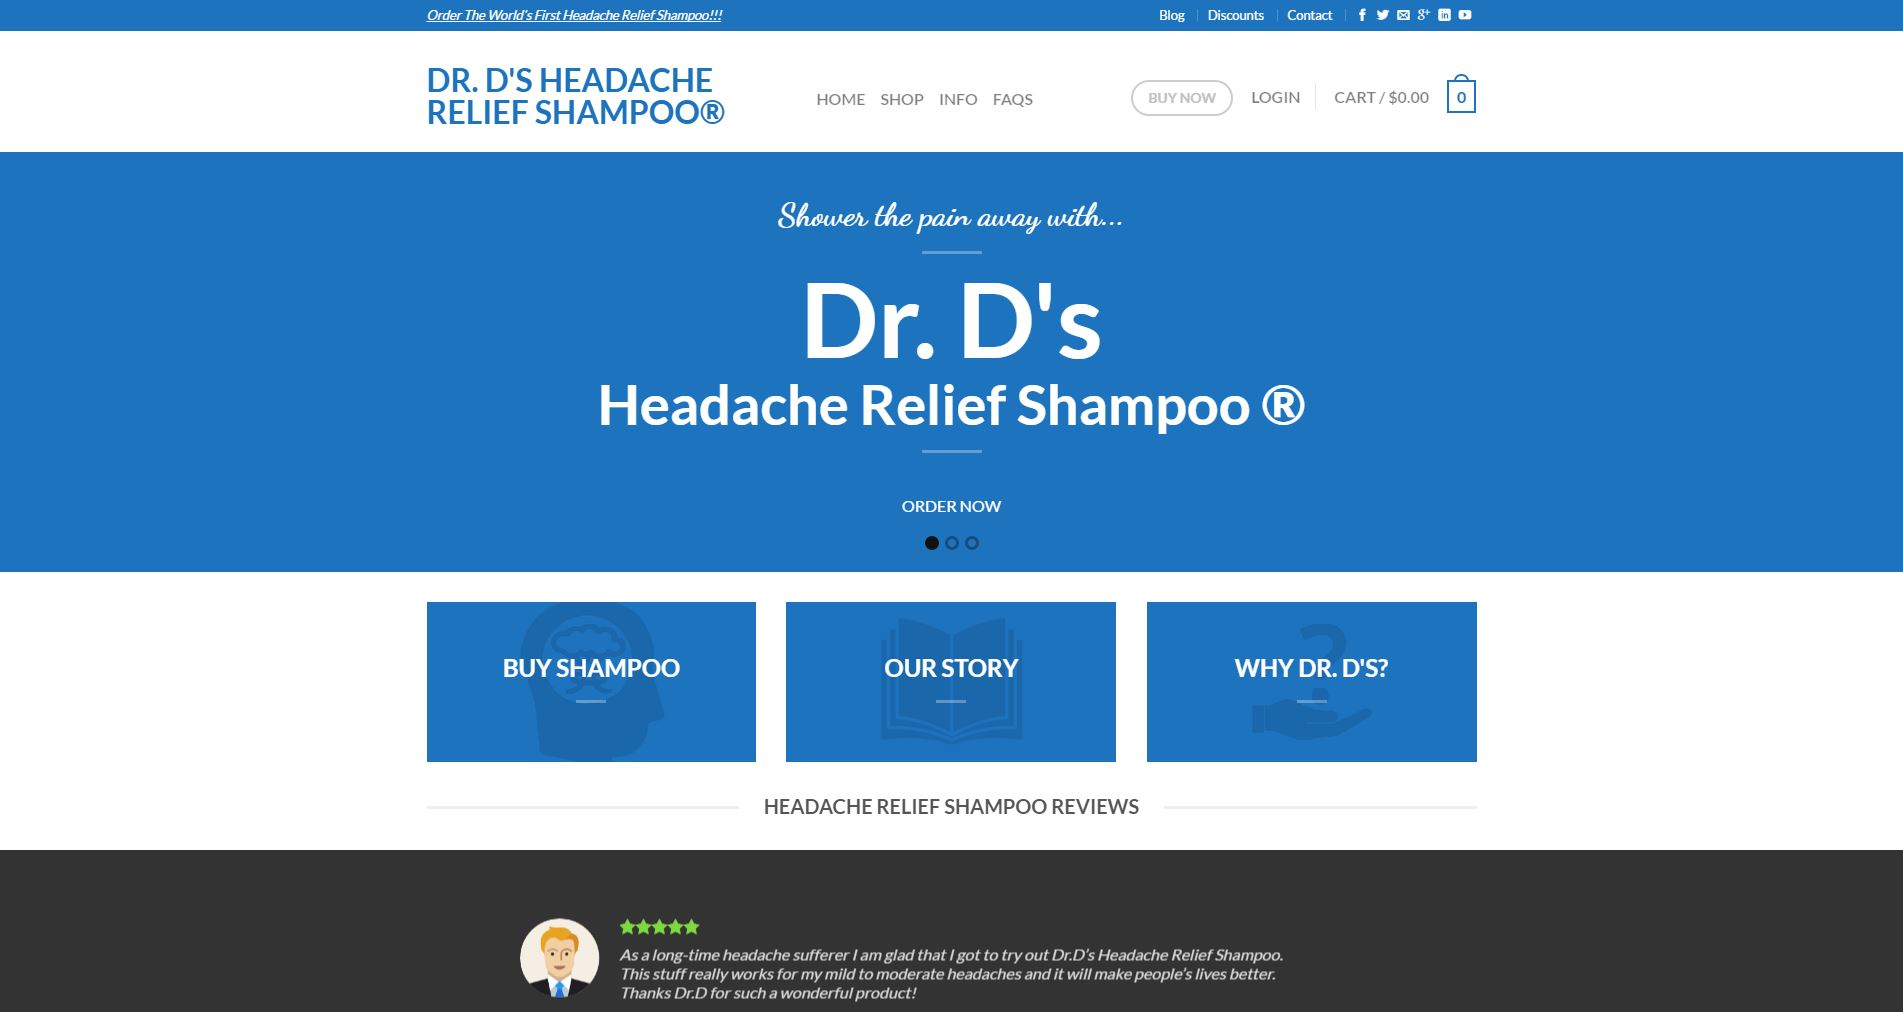 Medical E-commerce Website Design drd